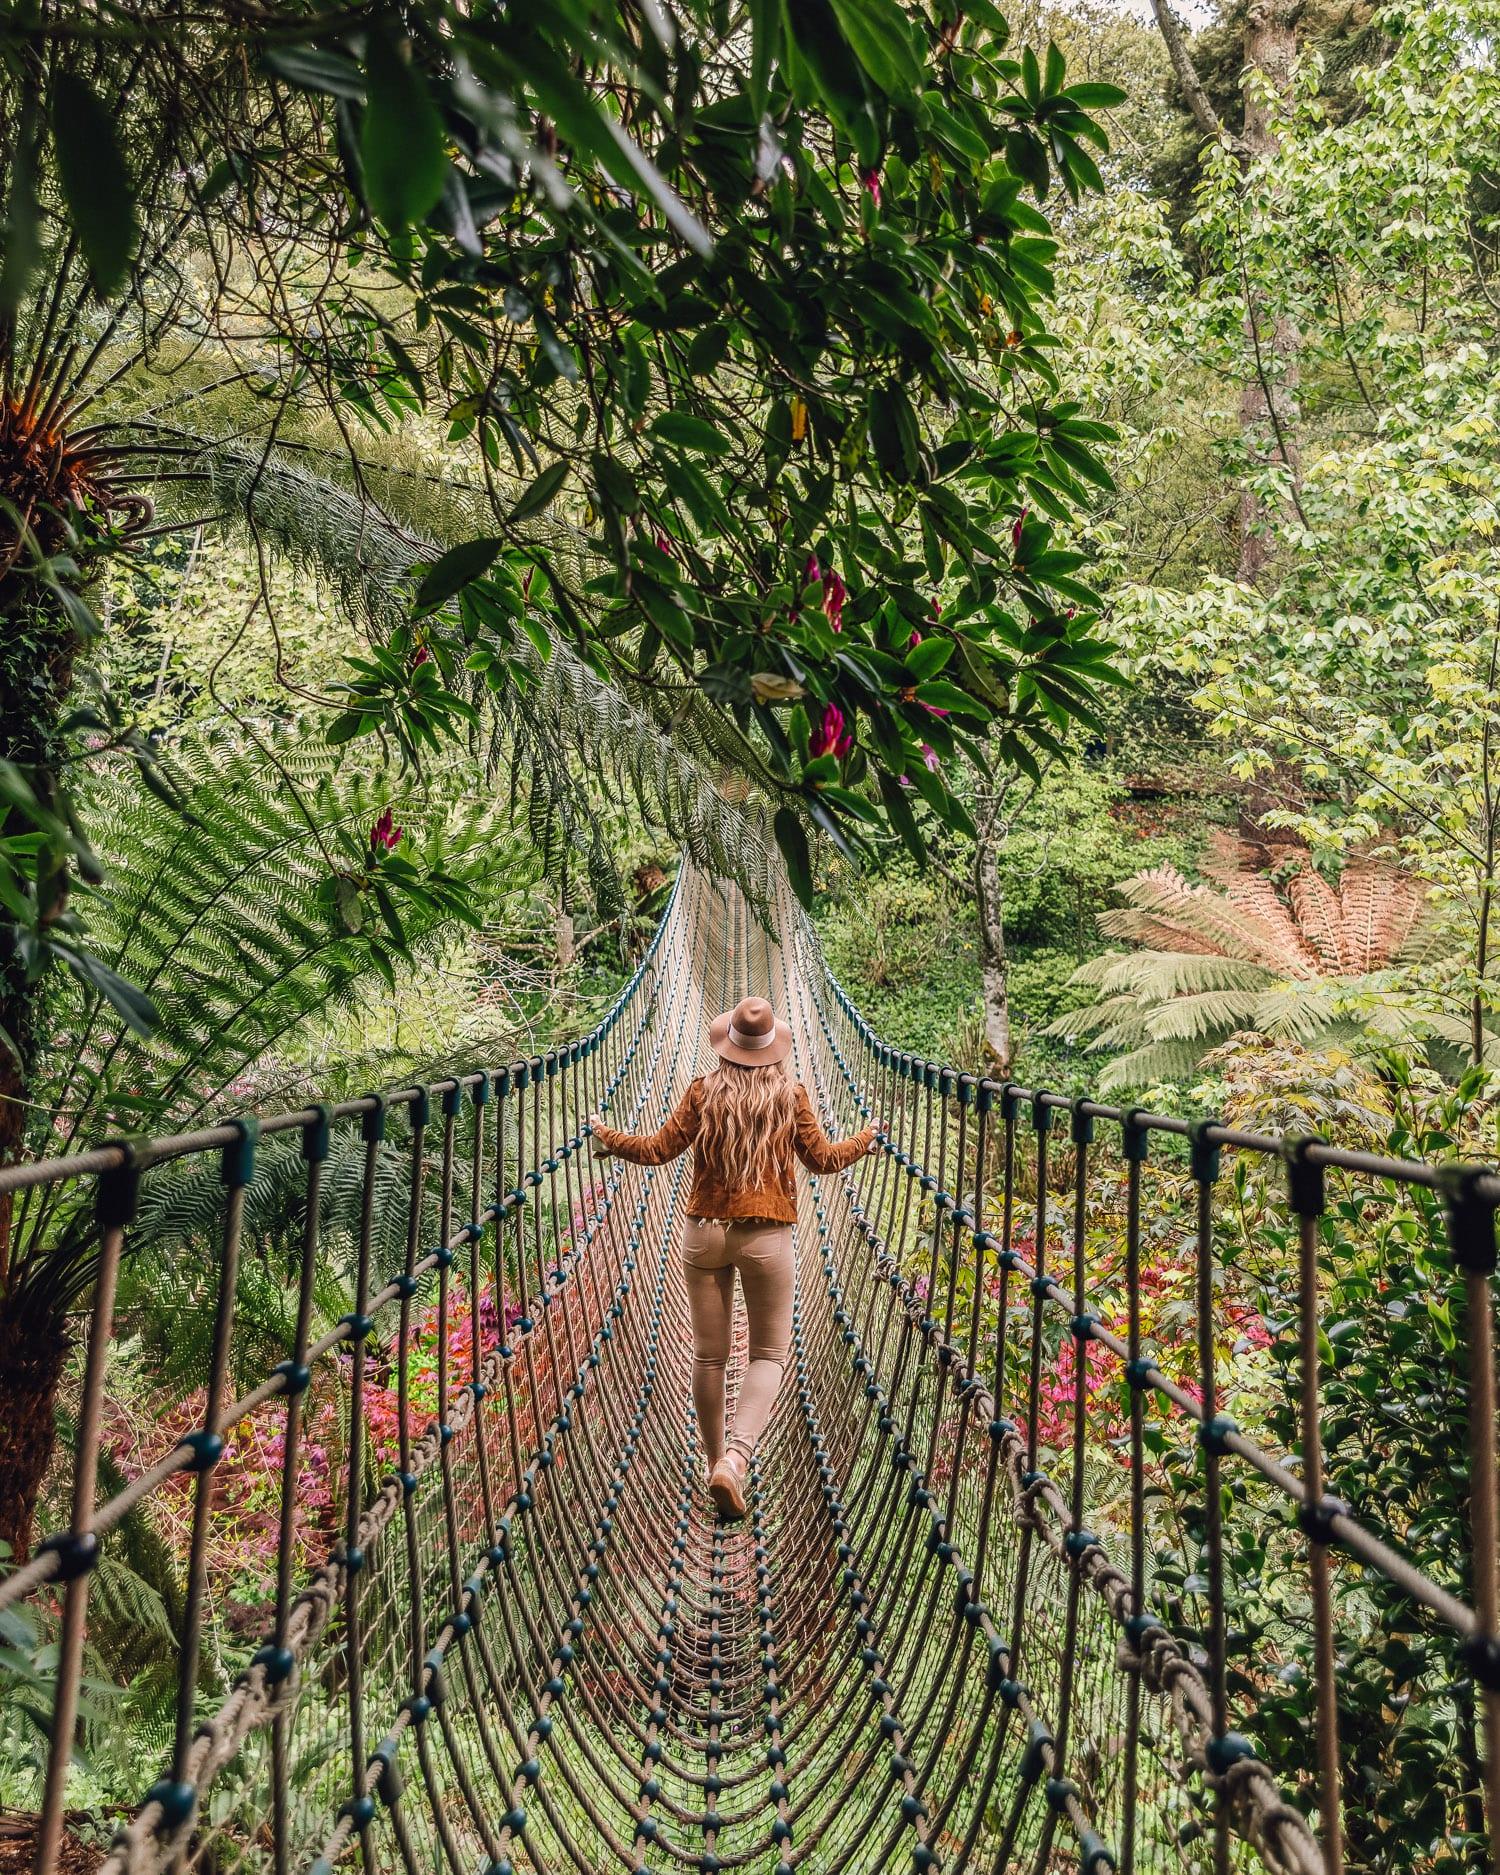 Burma Rope Bridge i The Lost Gardens of Heligan   Vacker Instagramplats i Cornwall, England